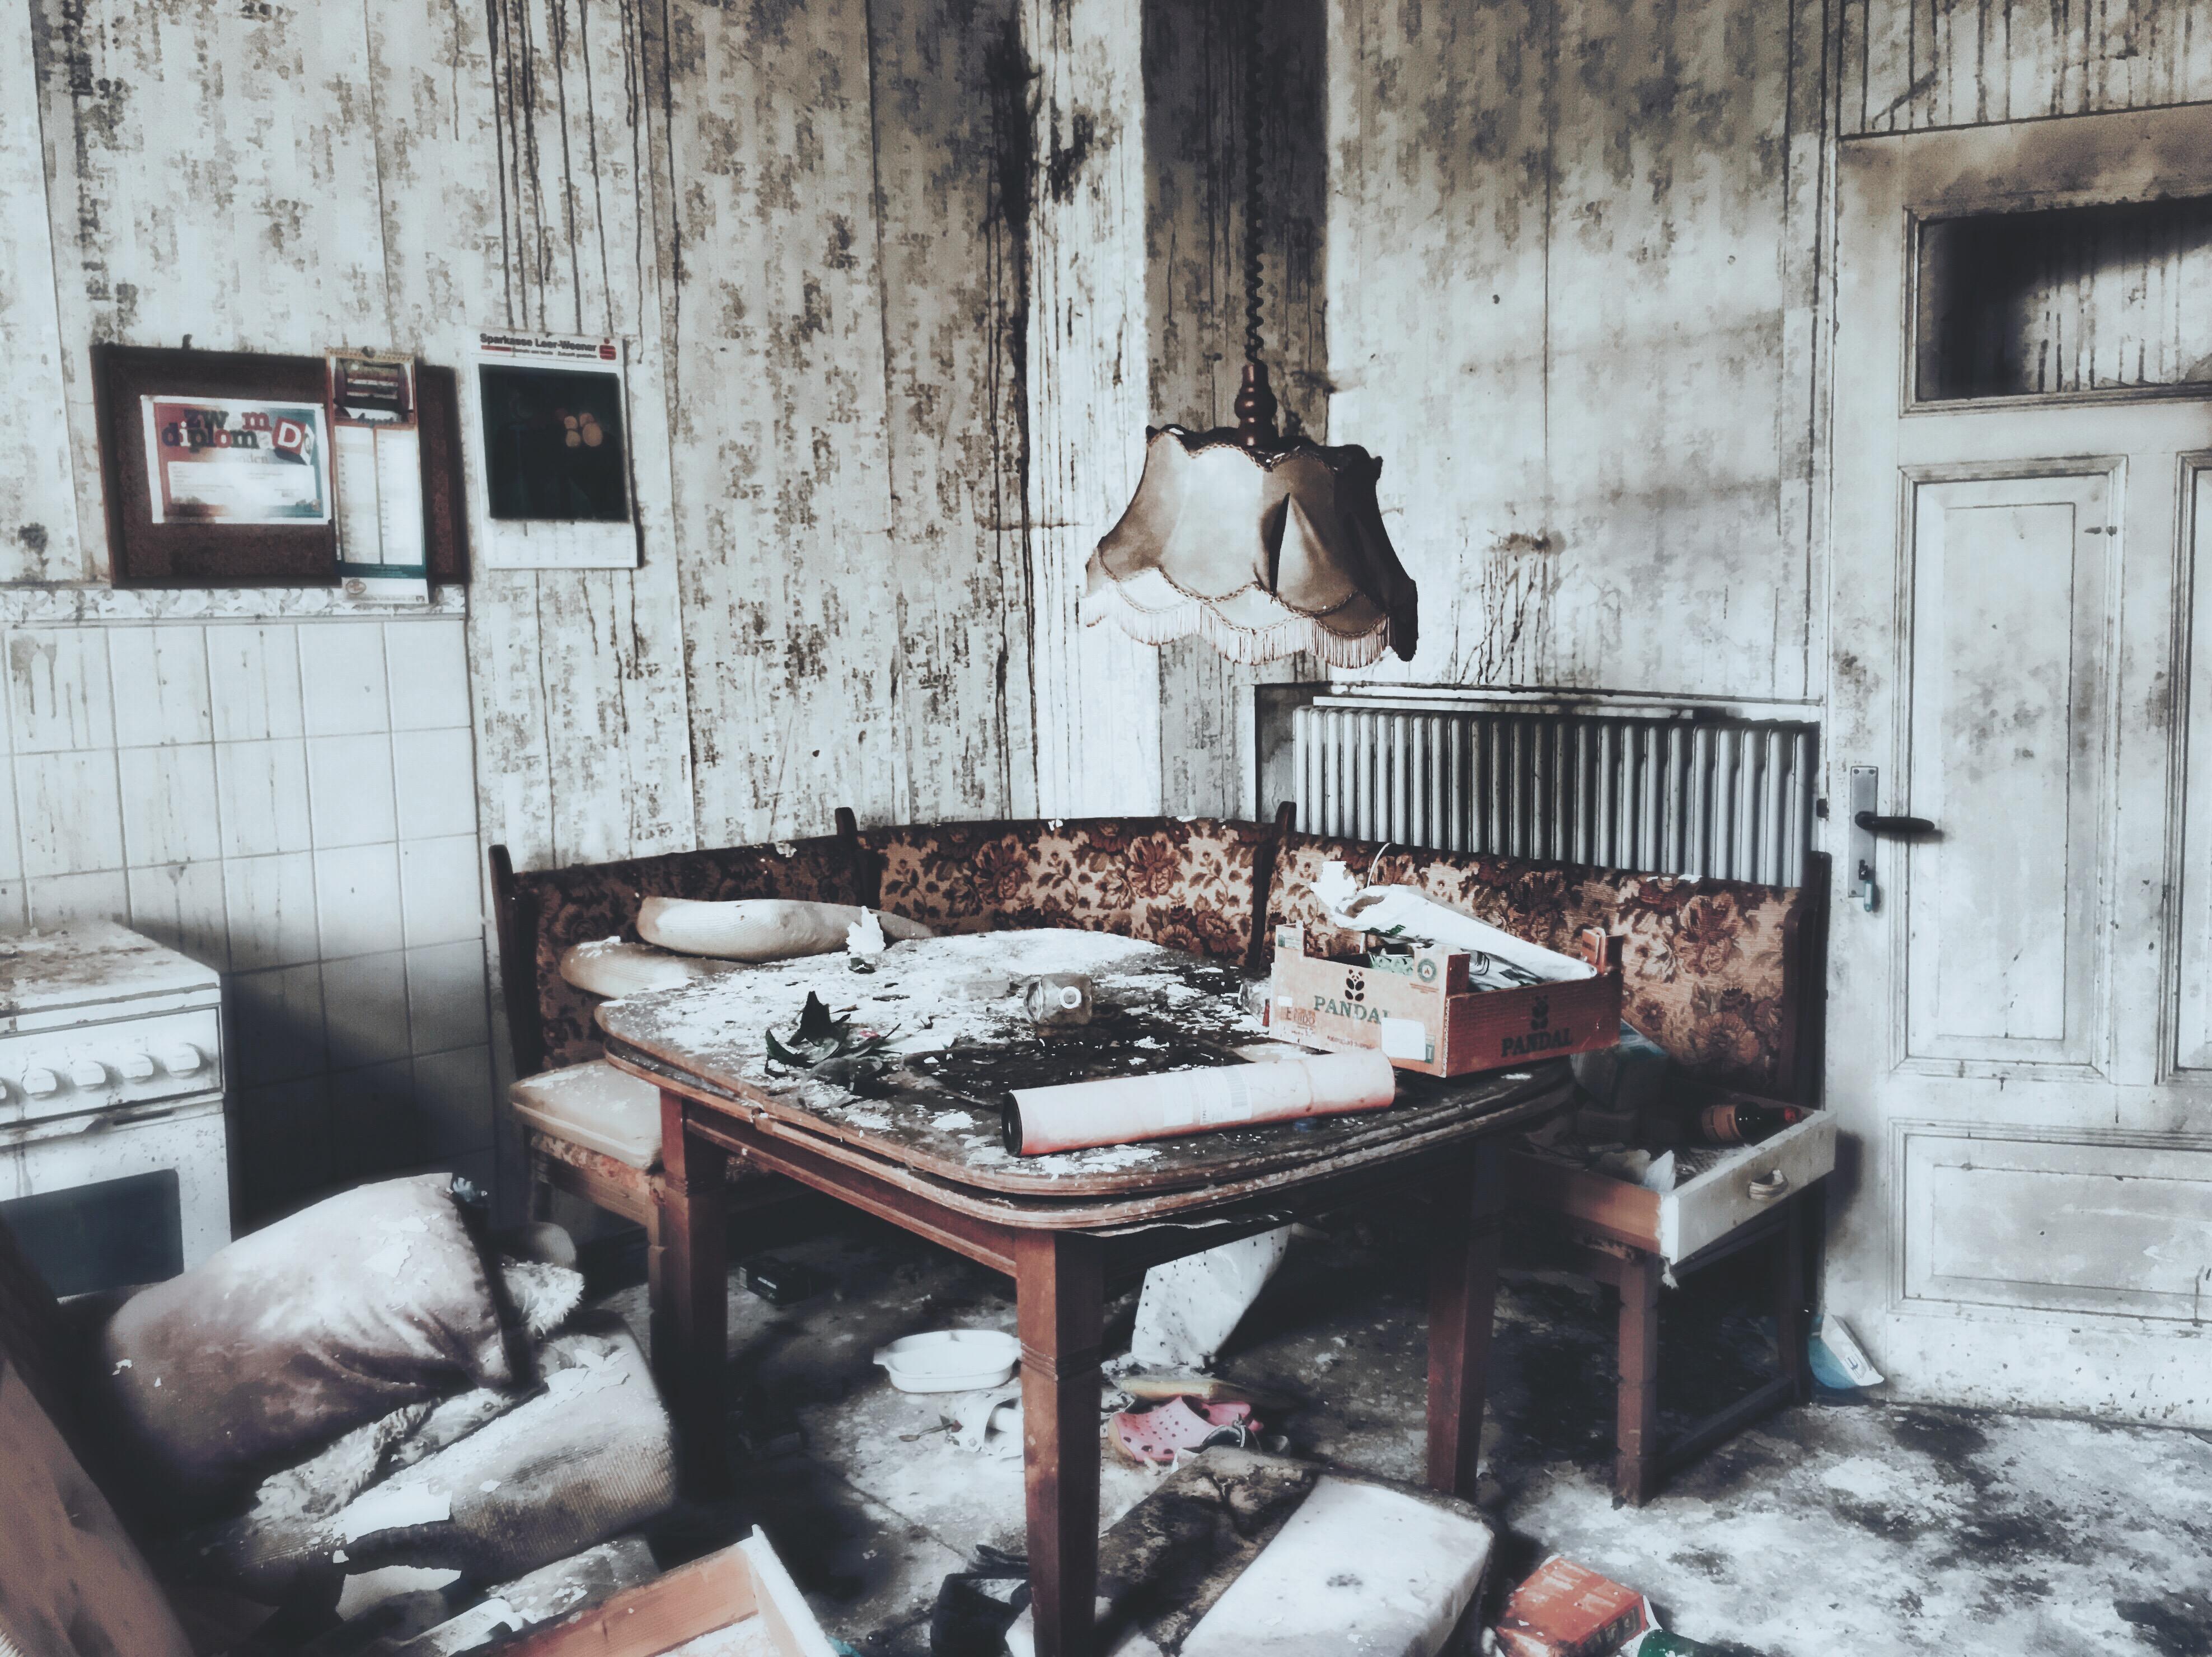 Hans Borghorst ~ Kitchen at deserted house